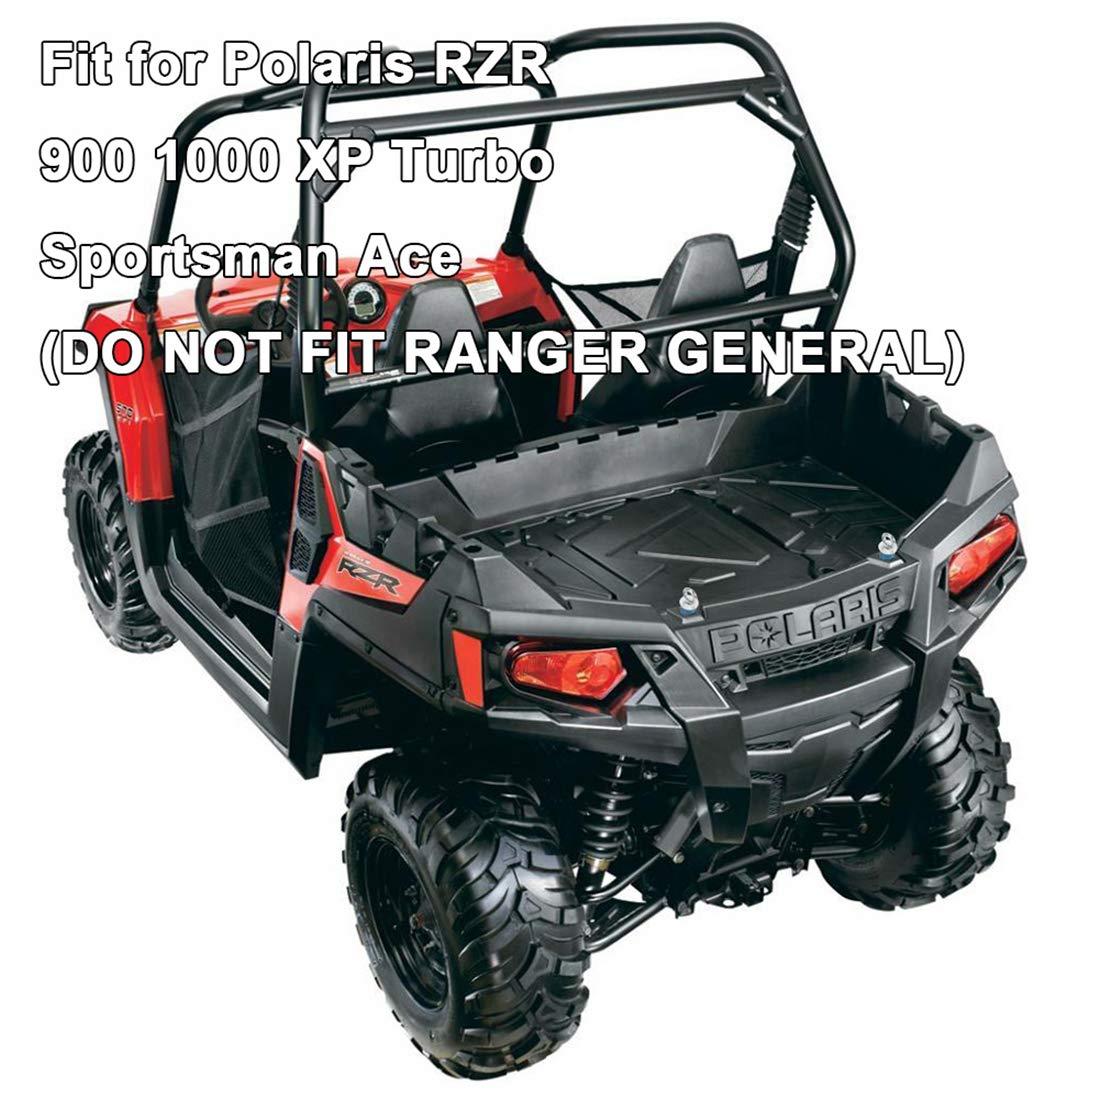 Amazon.com: KIWI MASTER Tie Down Anchors Compatible for Polaris RZR 900 1000 XP Turbo Sportsman Ace, Lock & Ride ATV Anchor (Not Fit Ranger): Automotive